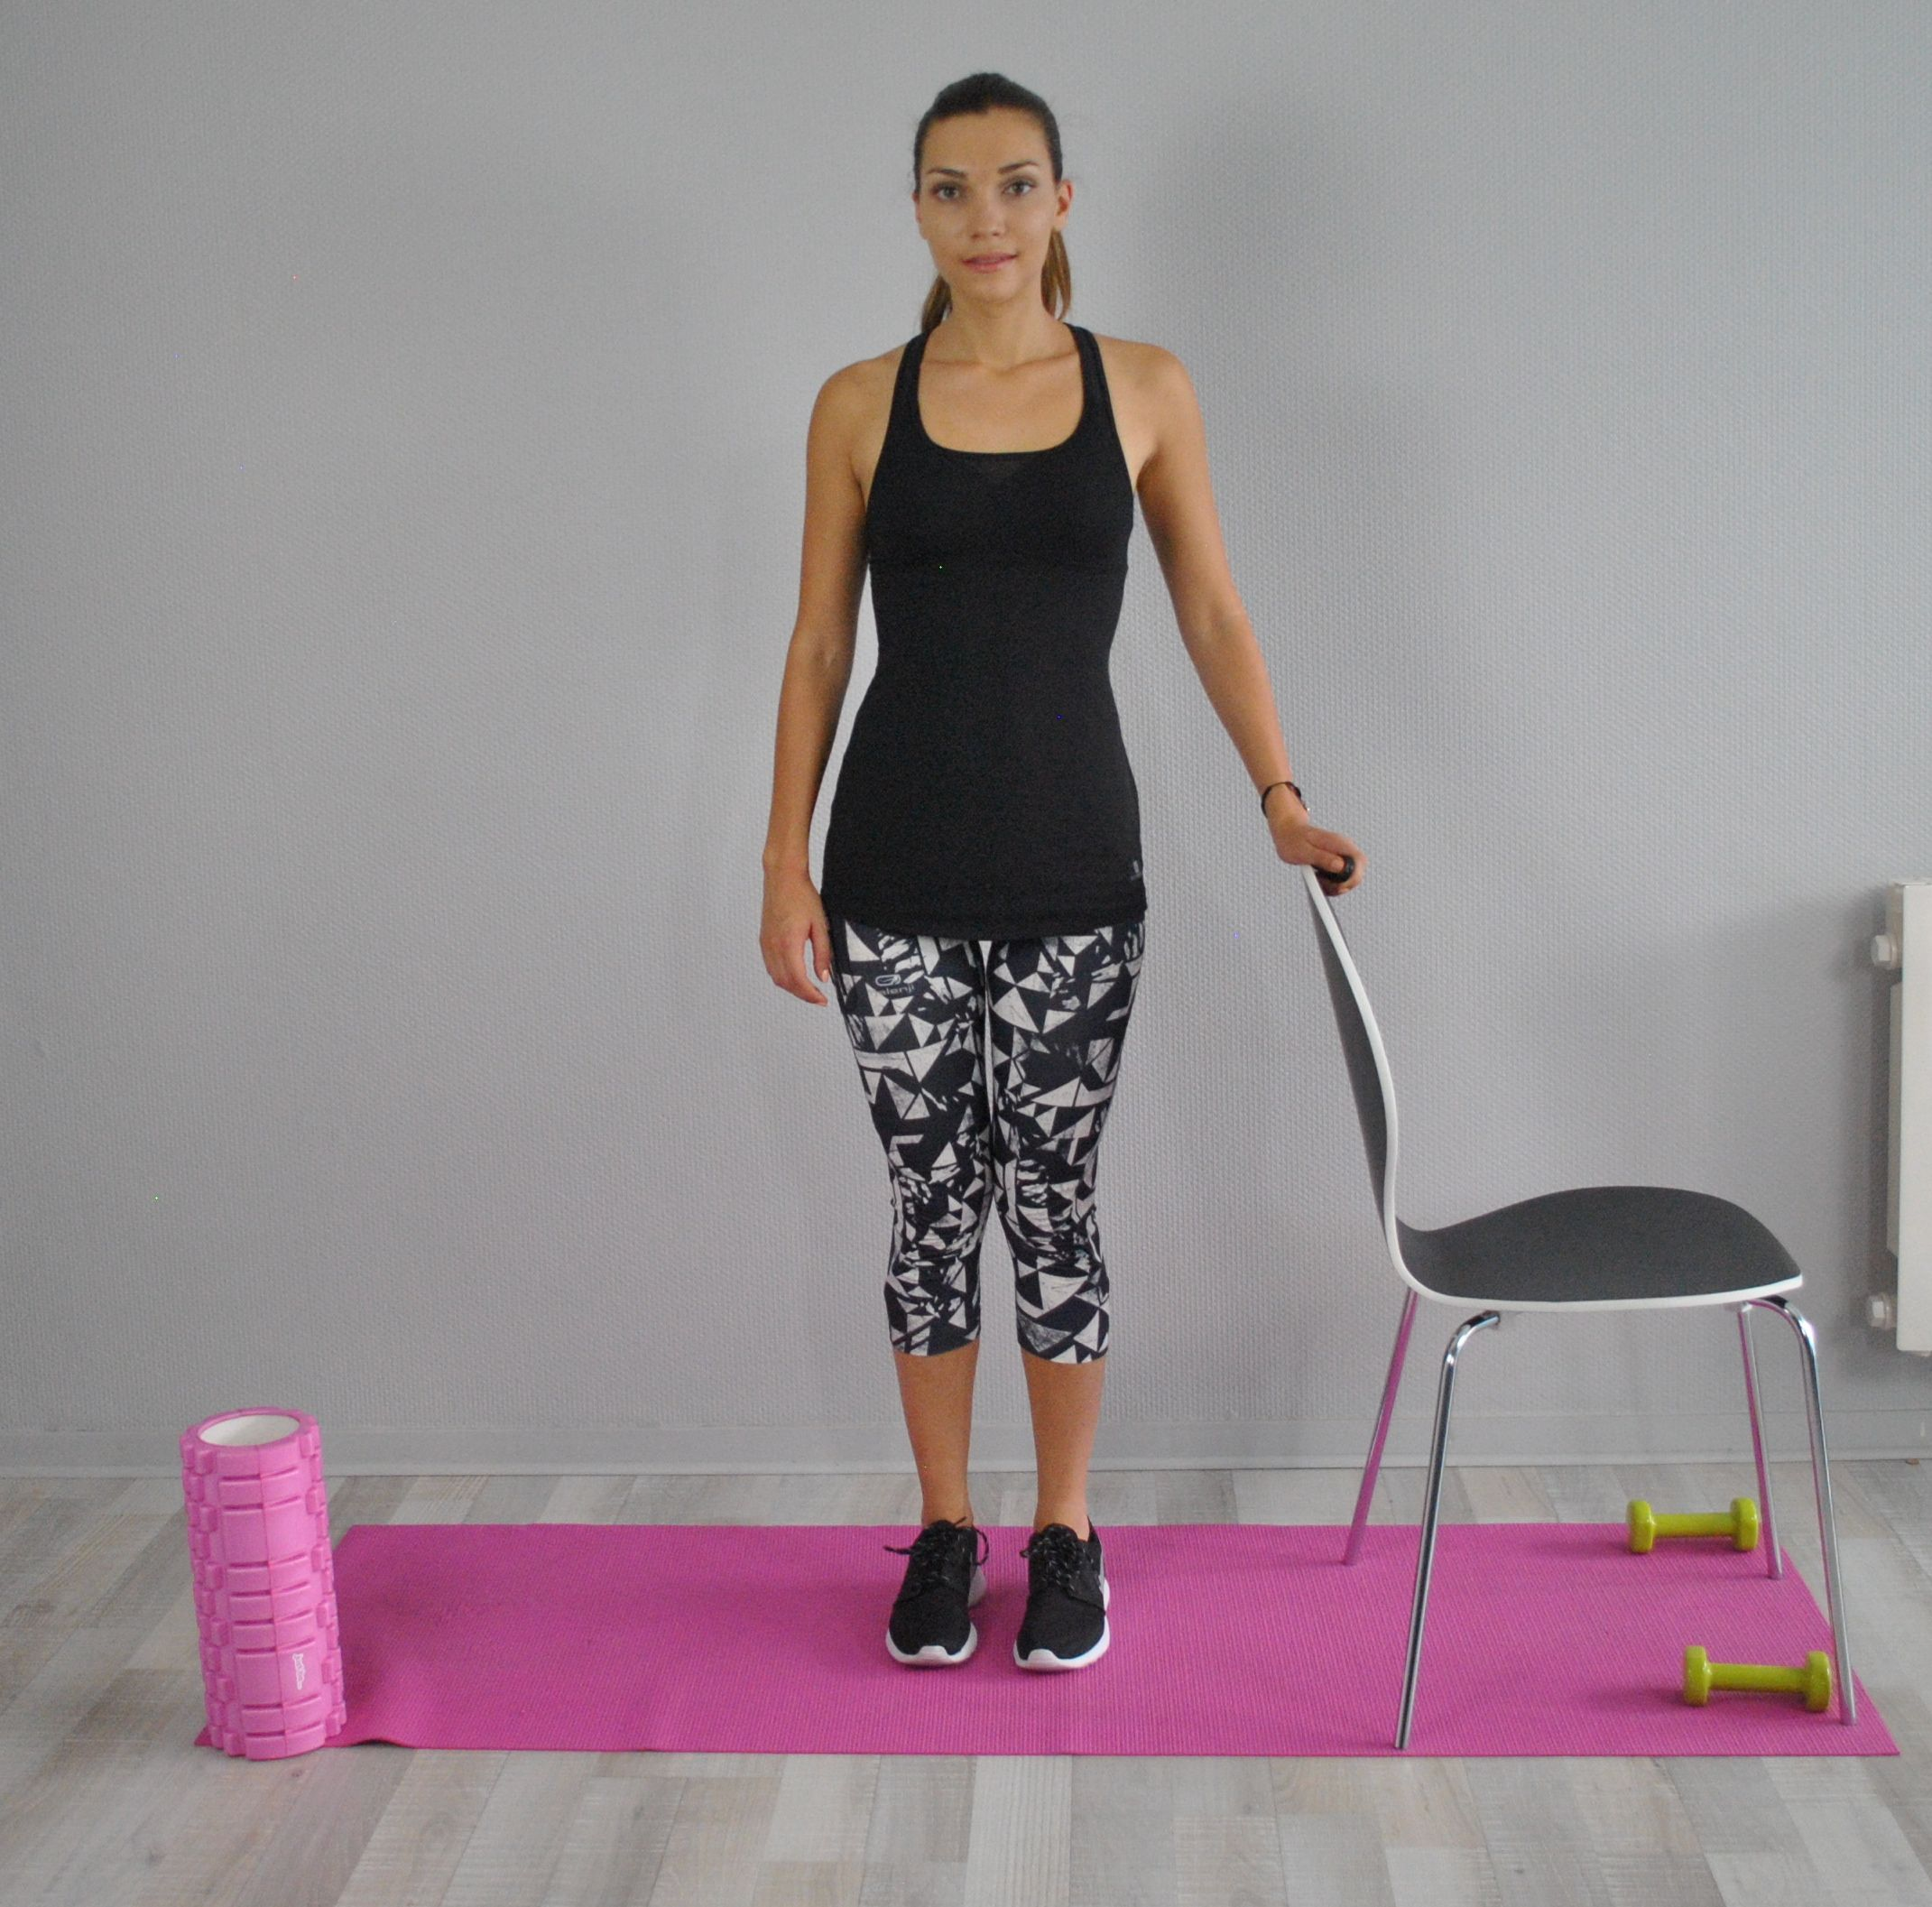 Exercice Fessiers Moyens Chaise Exercices A Faire A La Maison Exercice Sport Exercice